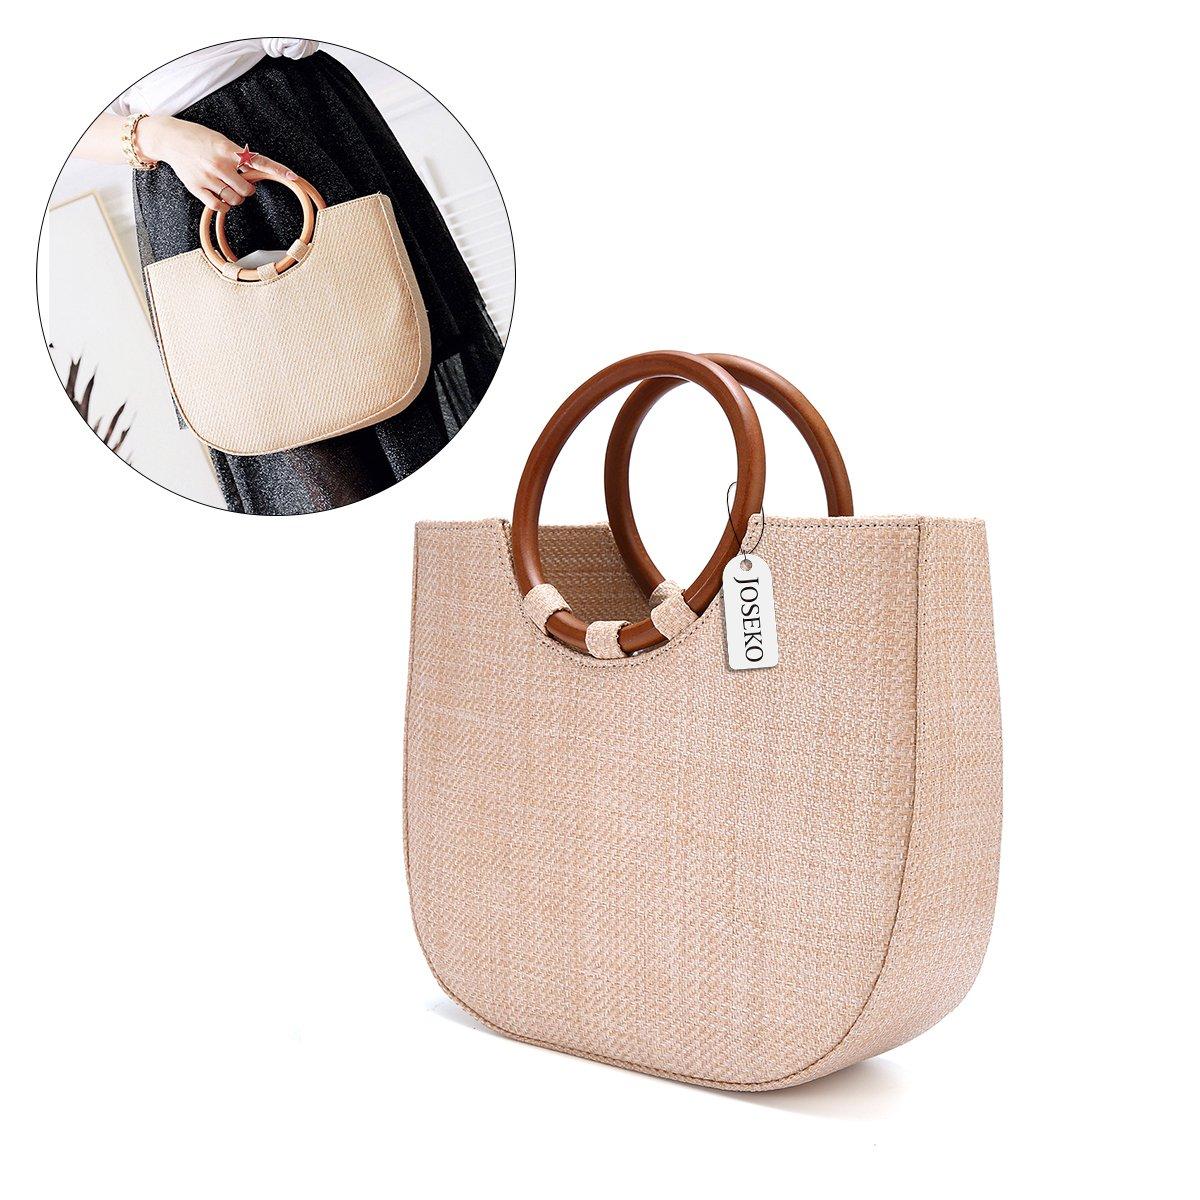 Summer Beach Bag, JOSEKO Womens Straw Handbag Straw Shoulder Bag for Beach Travel and Everyday Use Khaki 11.4''L x 3.5''W x 9.8''H